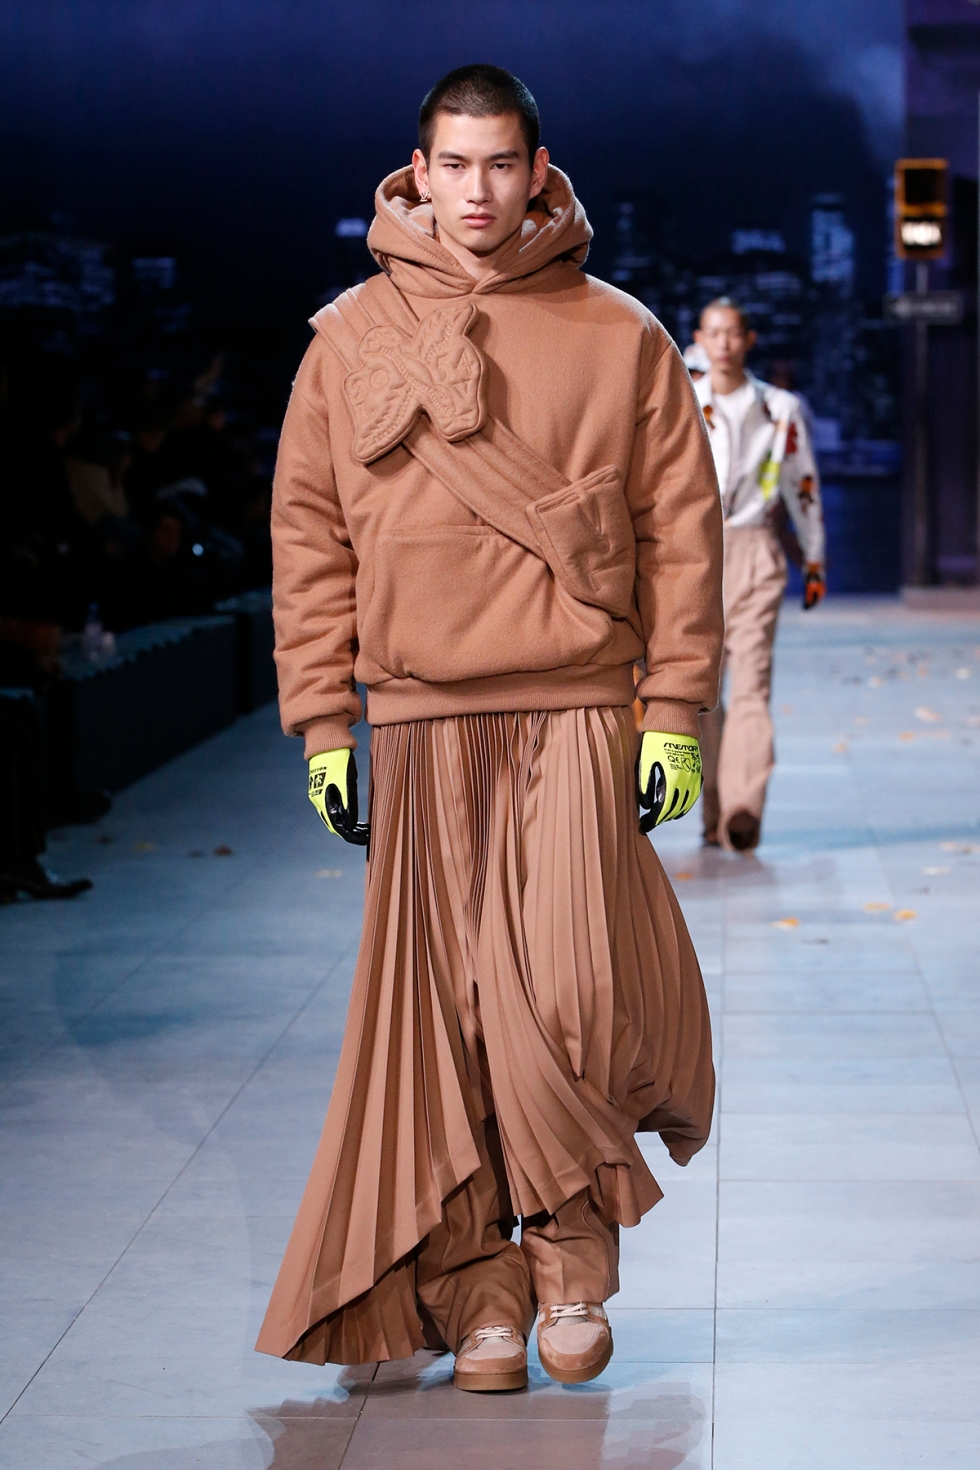 louis-vuitton-fall-winter-2019-paris-fashion-week-01